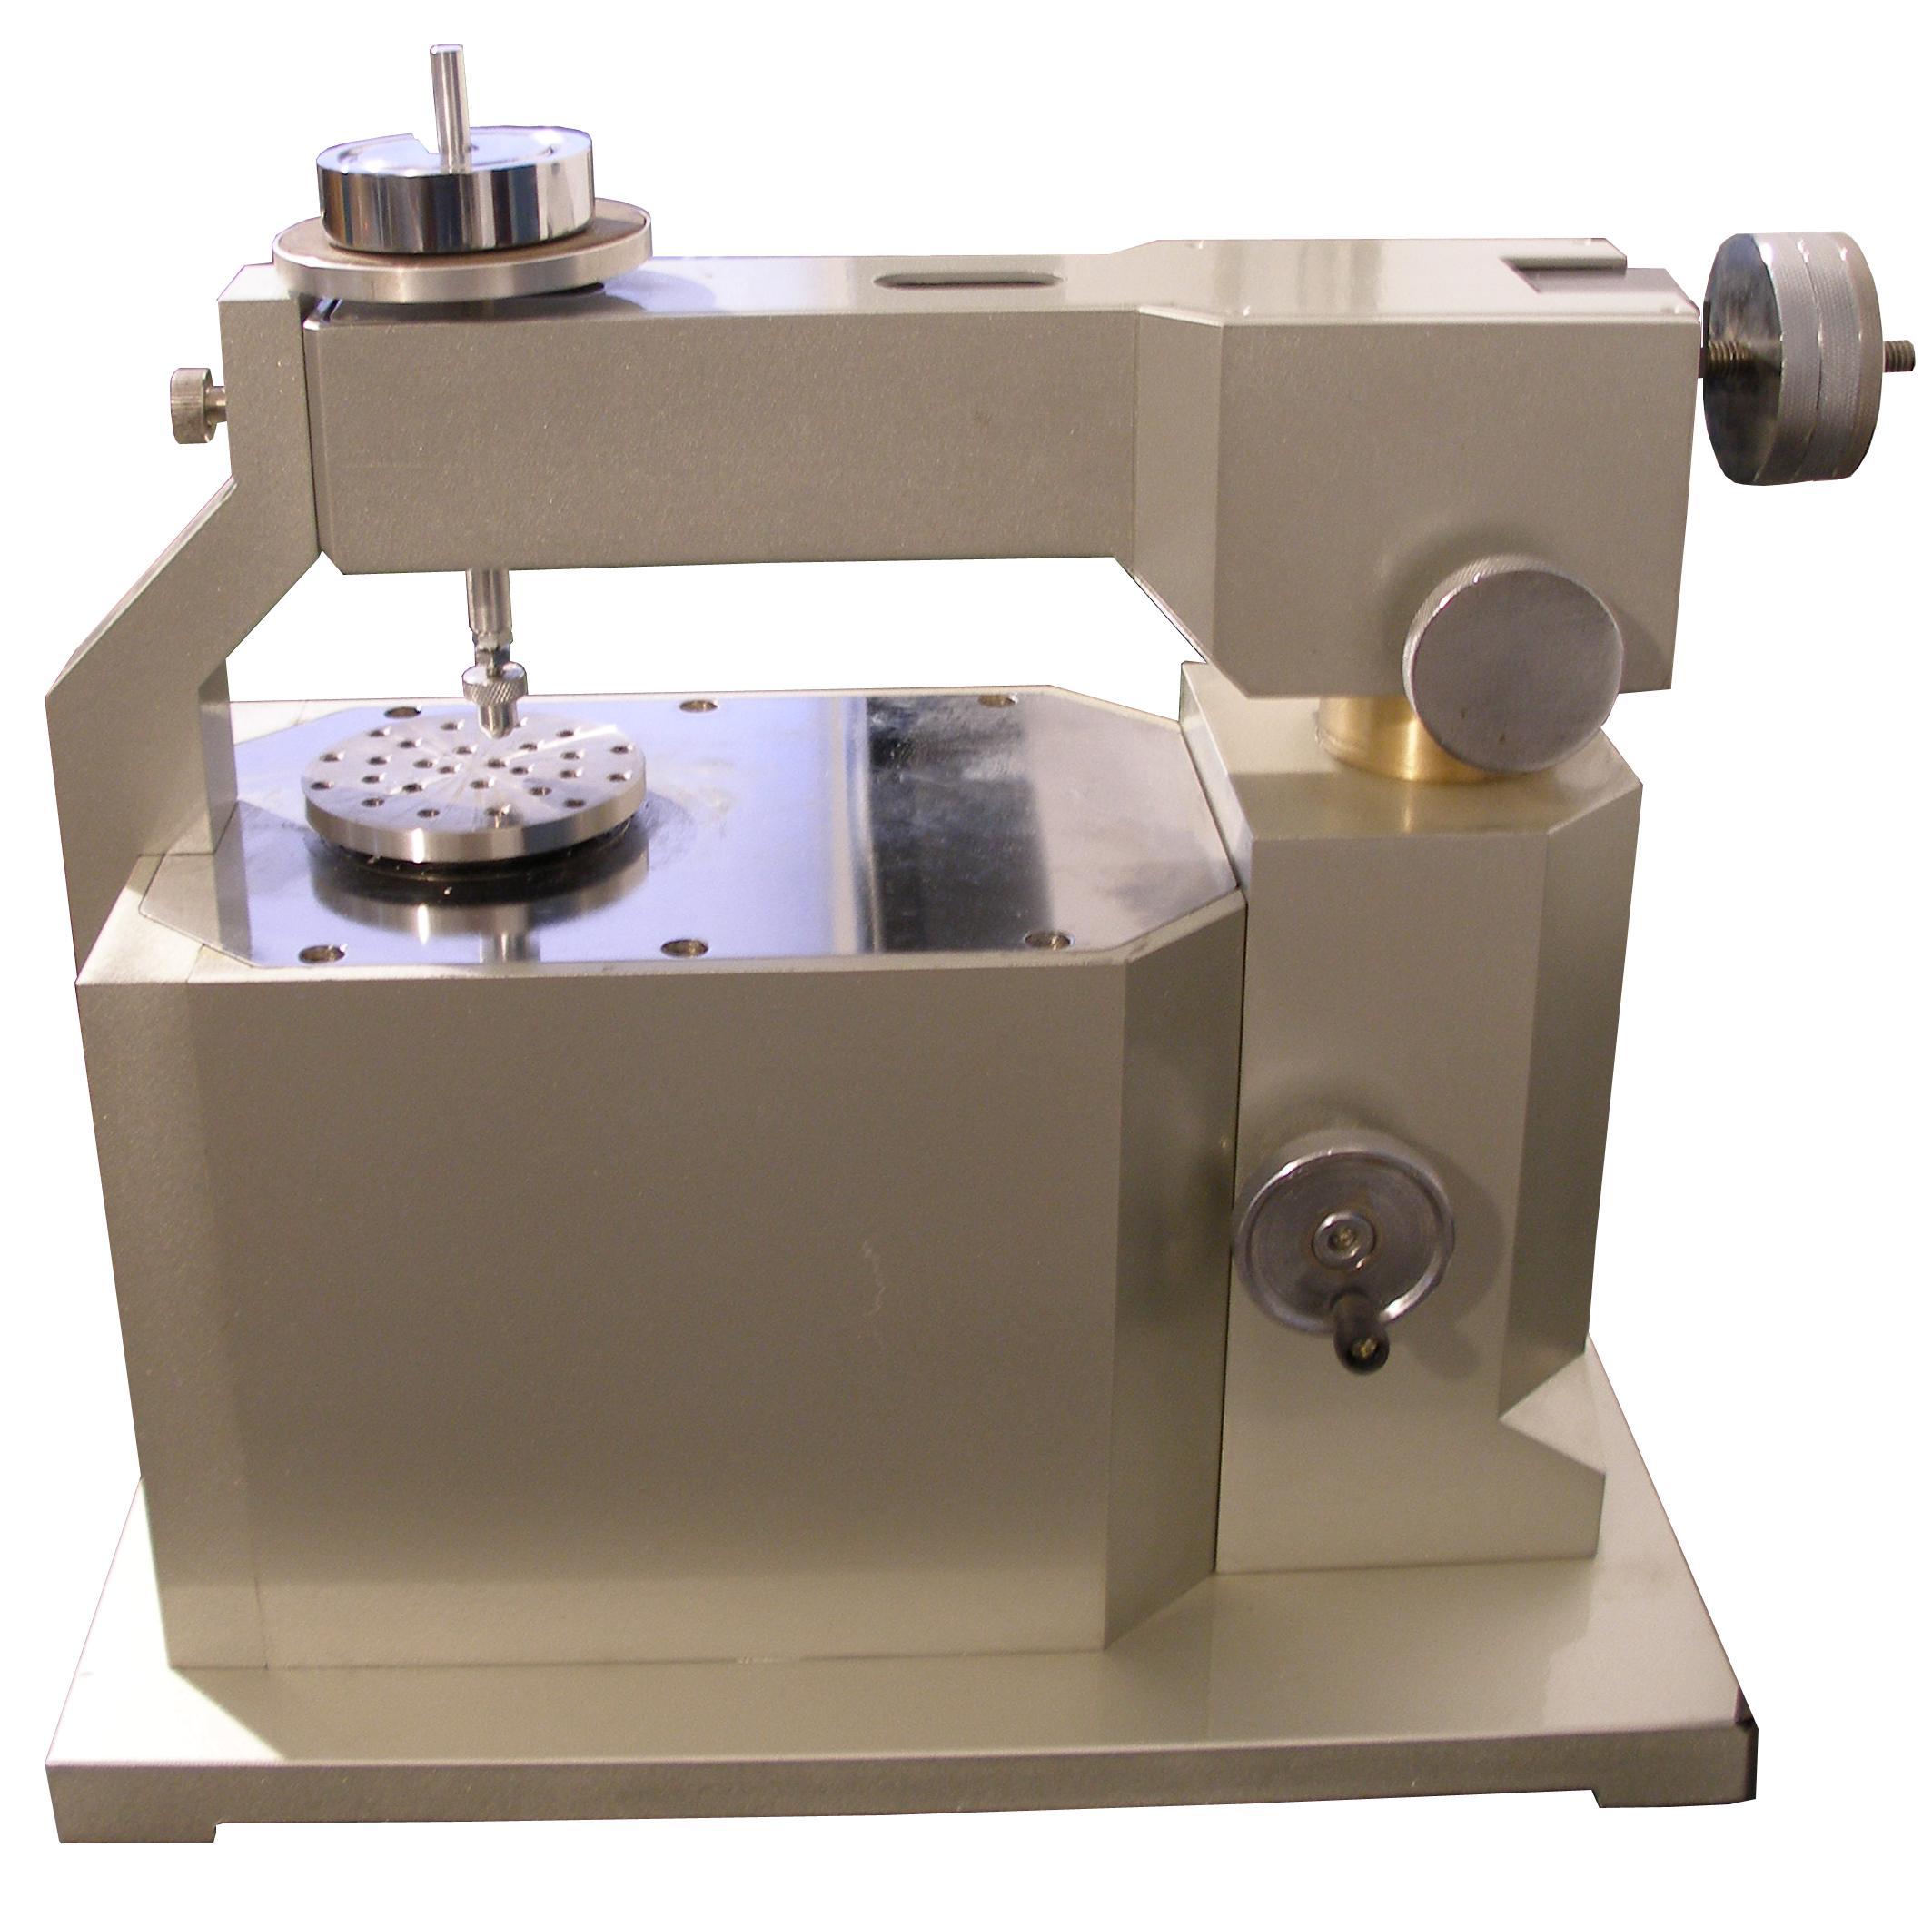 MS-T3000摩擦磨损试验仪,针对材料表面及薄膜的摩擦性能和耐磨强度可以进行定量的评价。还可进行在线摩擦静电测试以及含油、脂涂层的摩擦试验(需配附件)。  (仪器主机) 工作原理 MS-T3000摩擦磨损运用球-盘之间摩擦原理及微机自控技术,通过砝码或连续加载机构将负荷加至球上,作用于试样表面,同时试样固定在测试平台上,并以一定的速度旋转,使球摩擦涂层表面。通过传感器获取摩擦时的摩擦力信号,经放大处理,输入计算机经A/D转换将摩擦力信号通过运算得到摩擦系数变化曲线。 μ=F/N μ&mdas